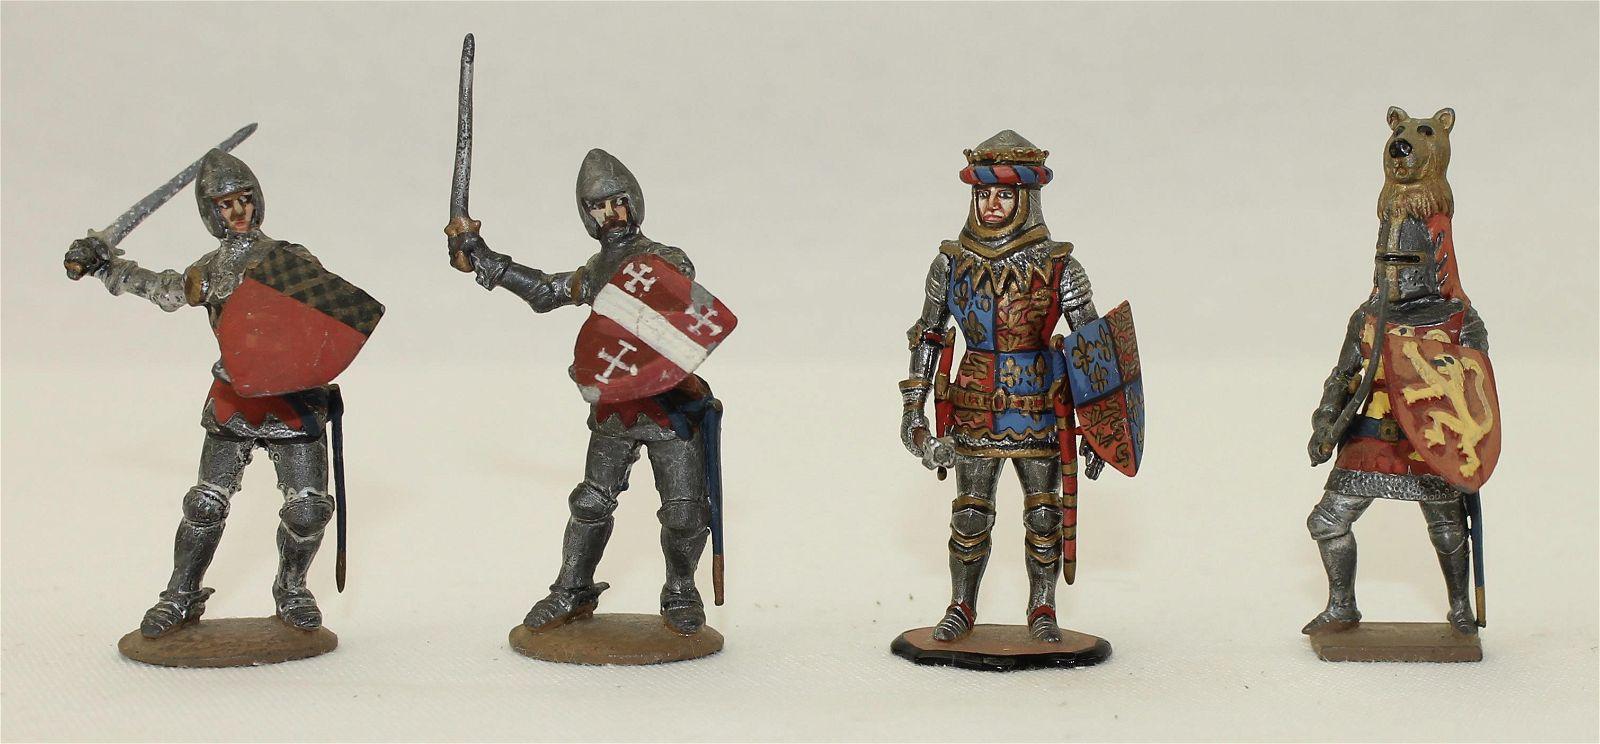 Tradition of London Lot King Henry V Knights